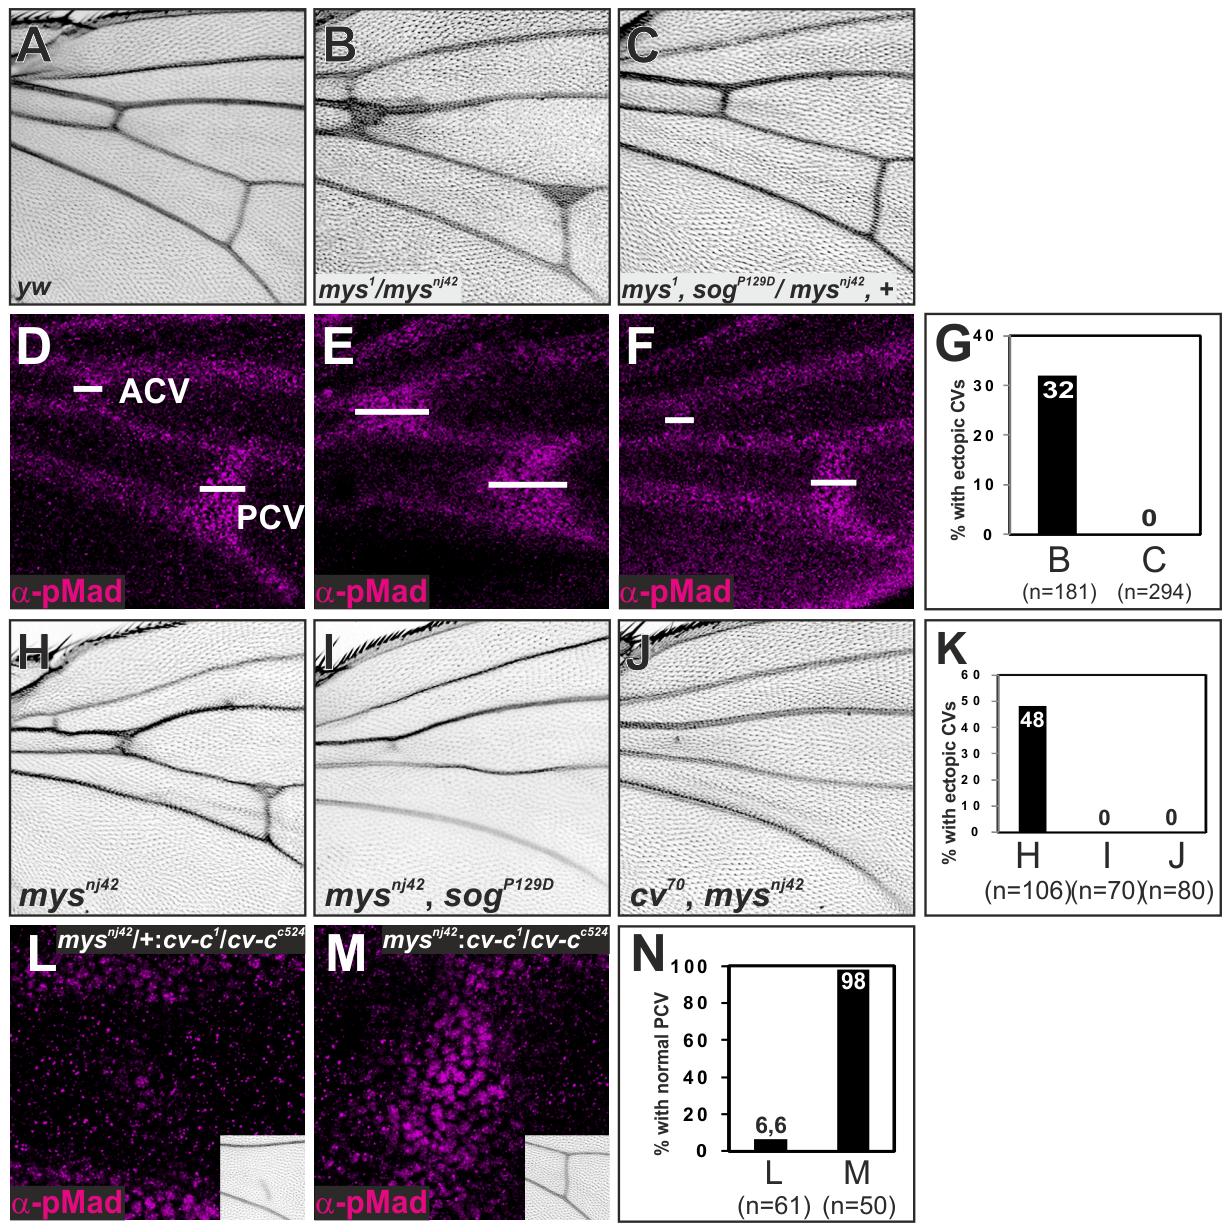 ß-integrin links Sog-Cv-dependent BMP signaling and PCV morphogenesis.